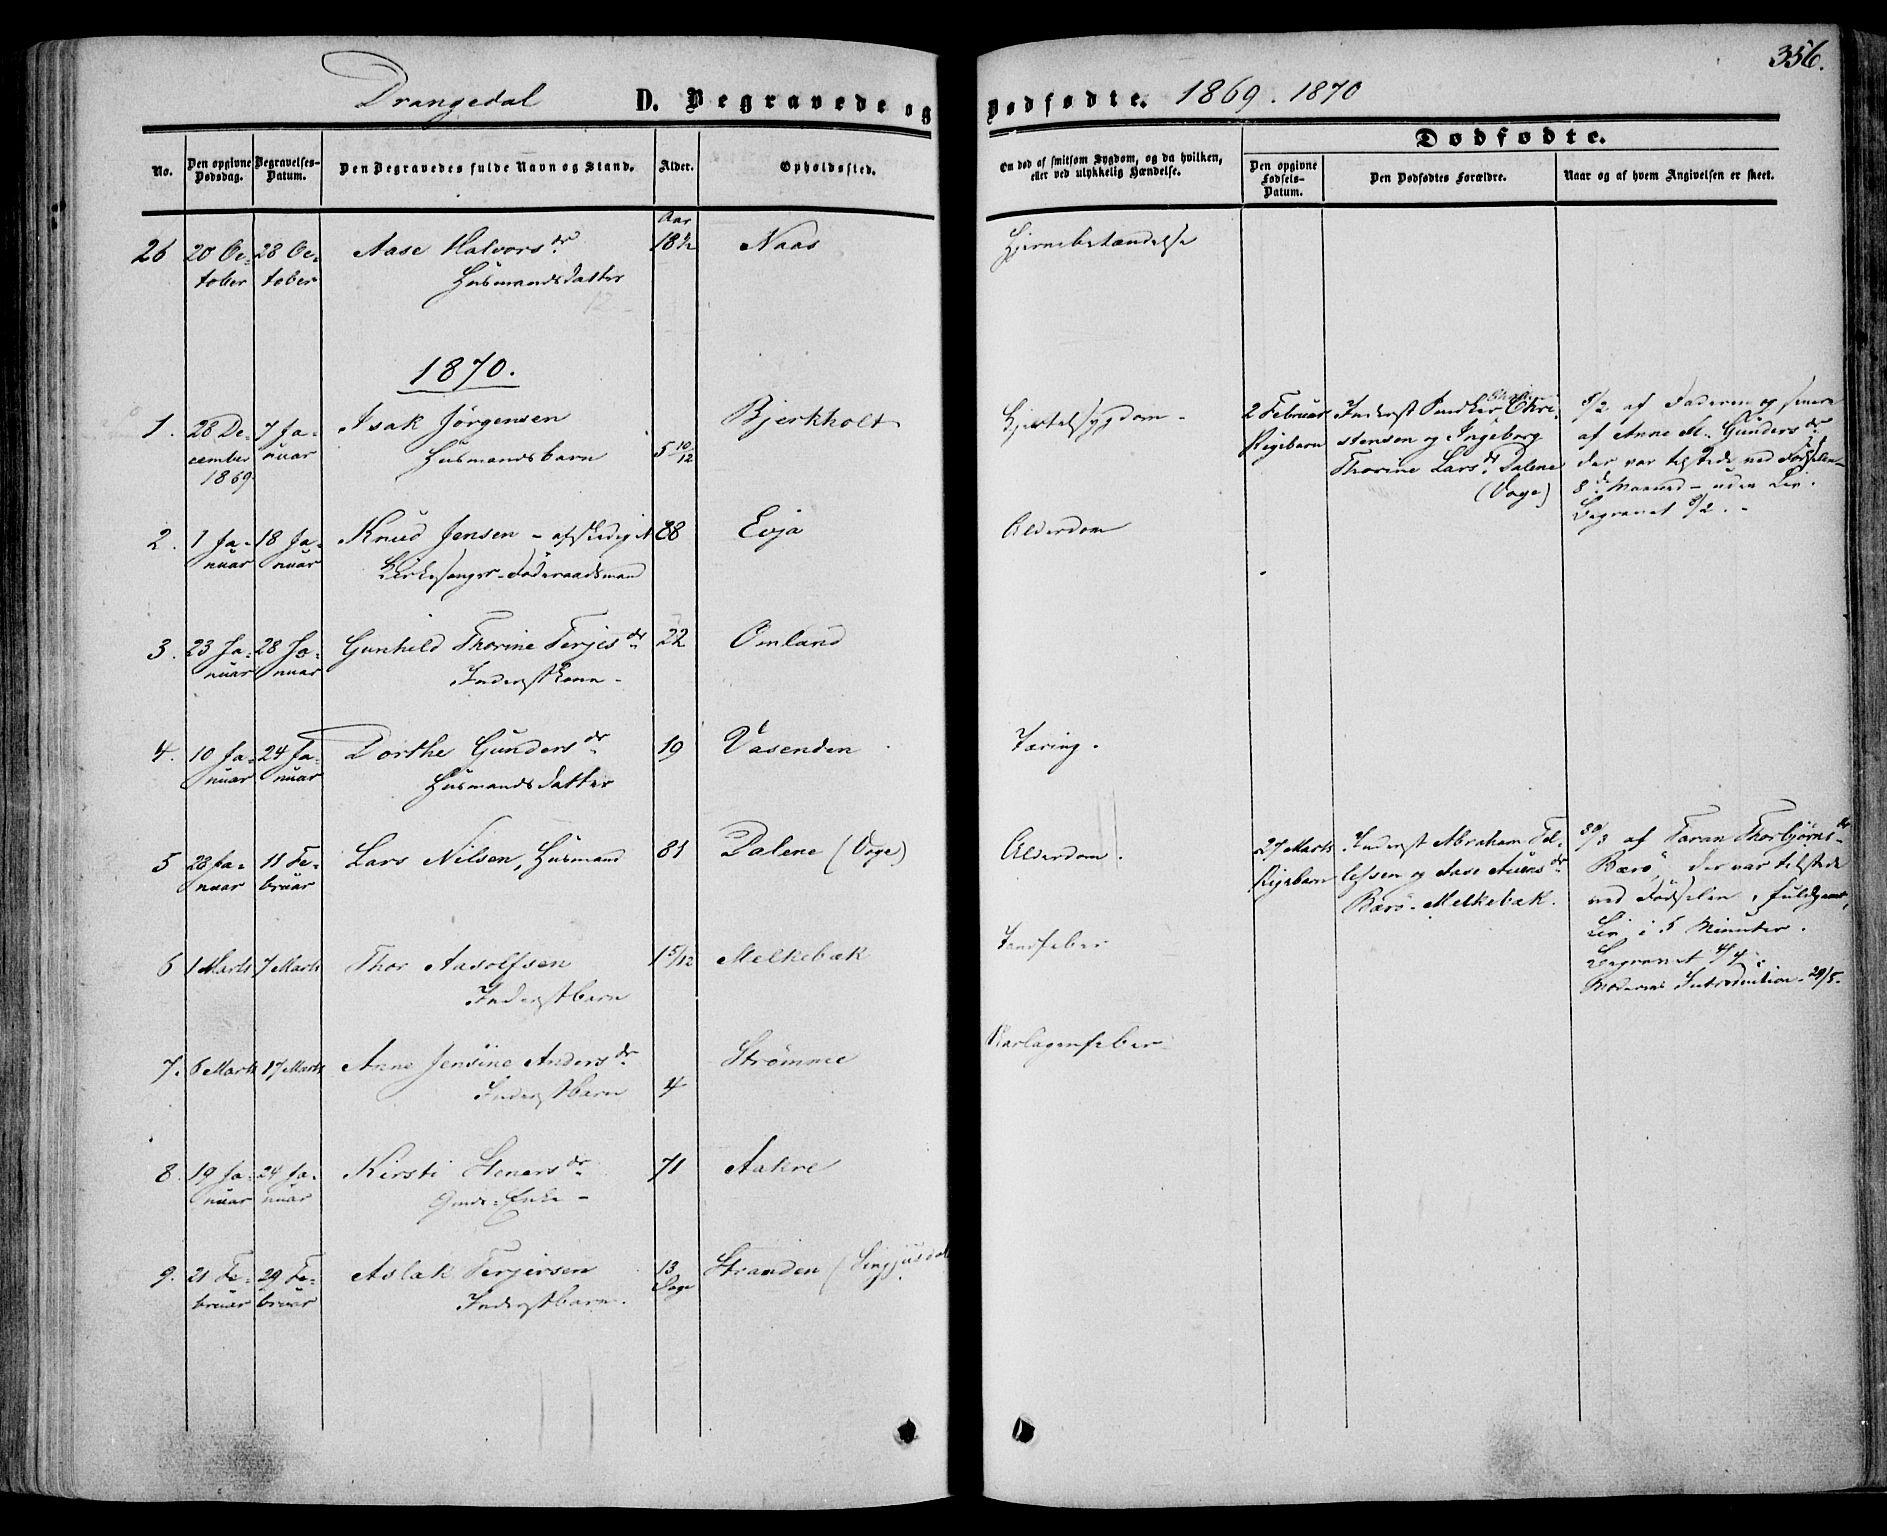 SAKO, Drangedal kirkebøker, F/Fa/L0008: Ministerialbok nr. 8, 1857-1871, s. 356